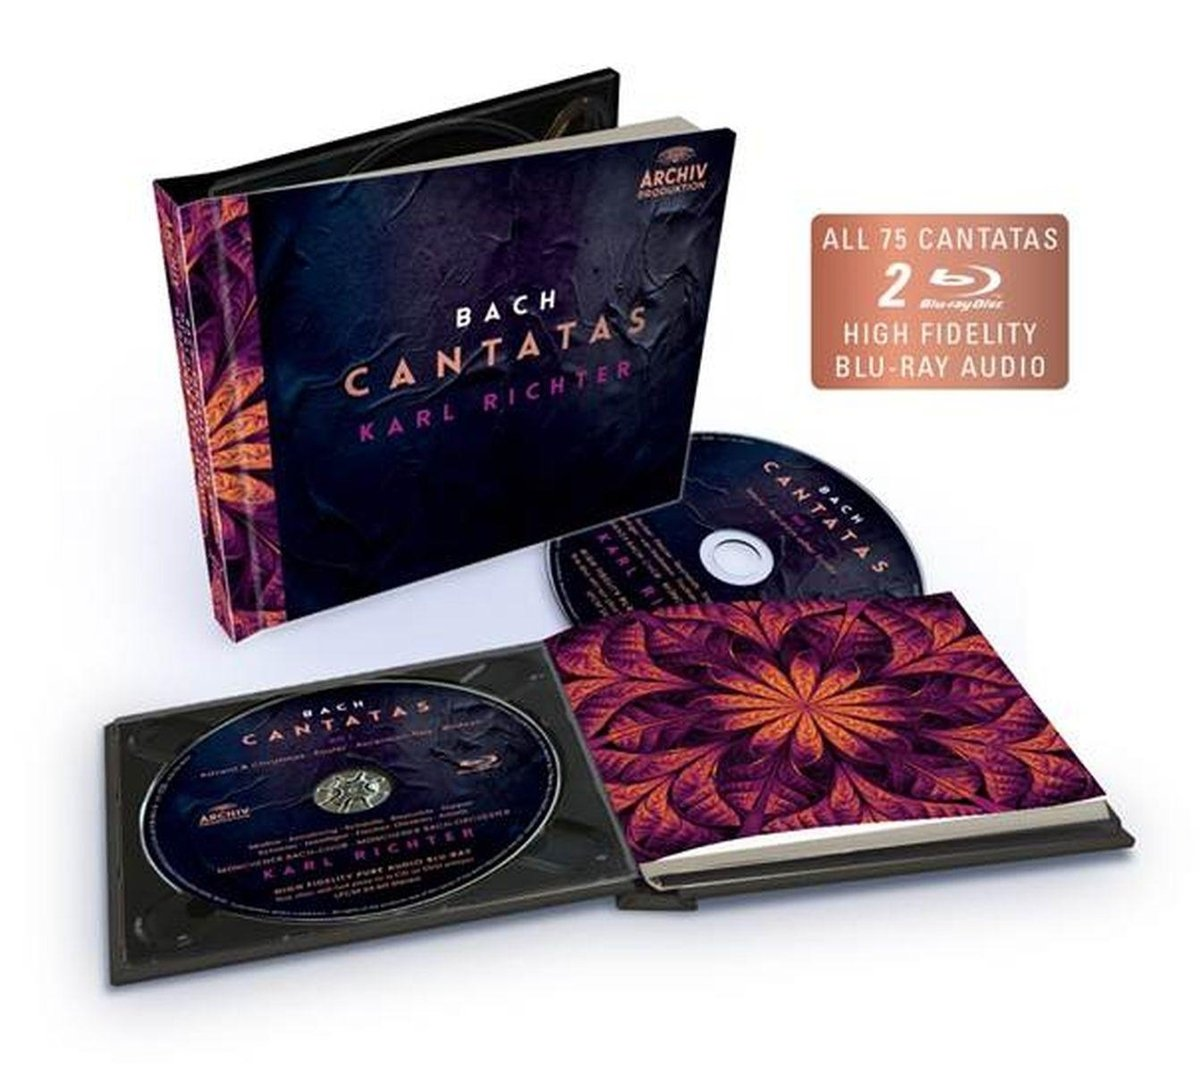 Blu-ray Audio : Karl Richter/Mnchener Bach-Chor/Mnchener Bach-Orchest - Cantatas (2PC)